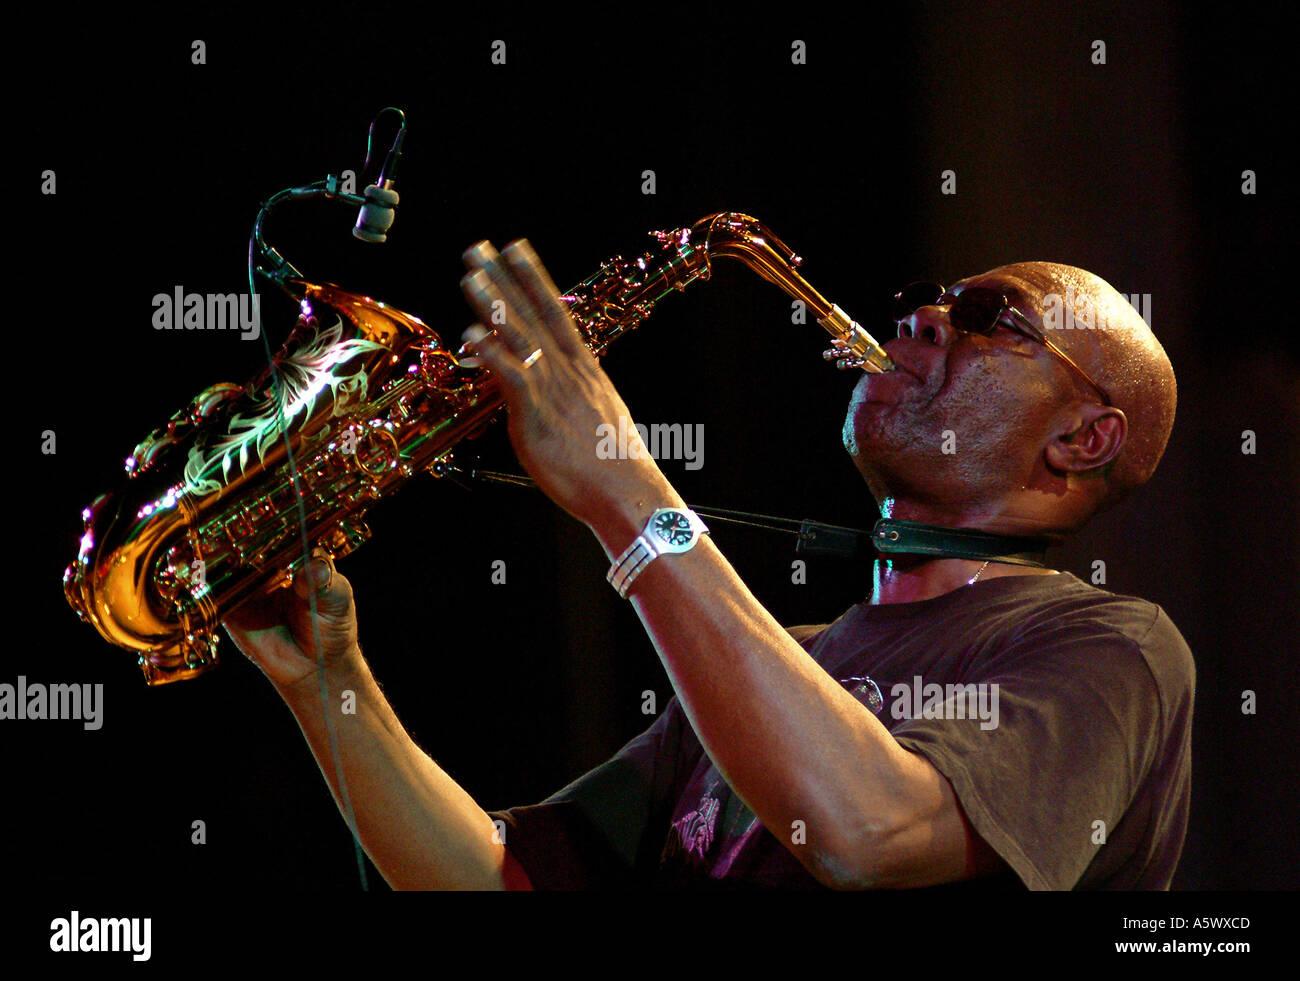 Manu Dibango performing at the Red Sea Jazz Festival in Eilat Israel - Stock Image